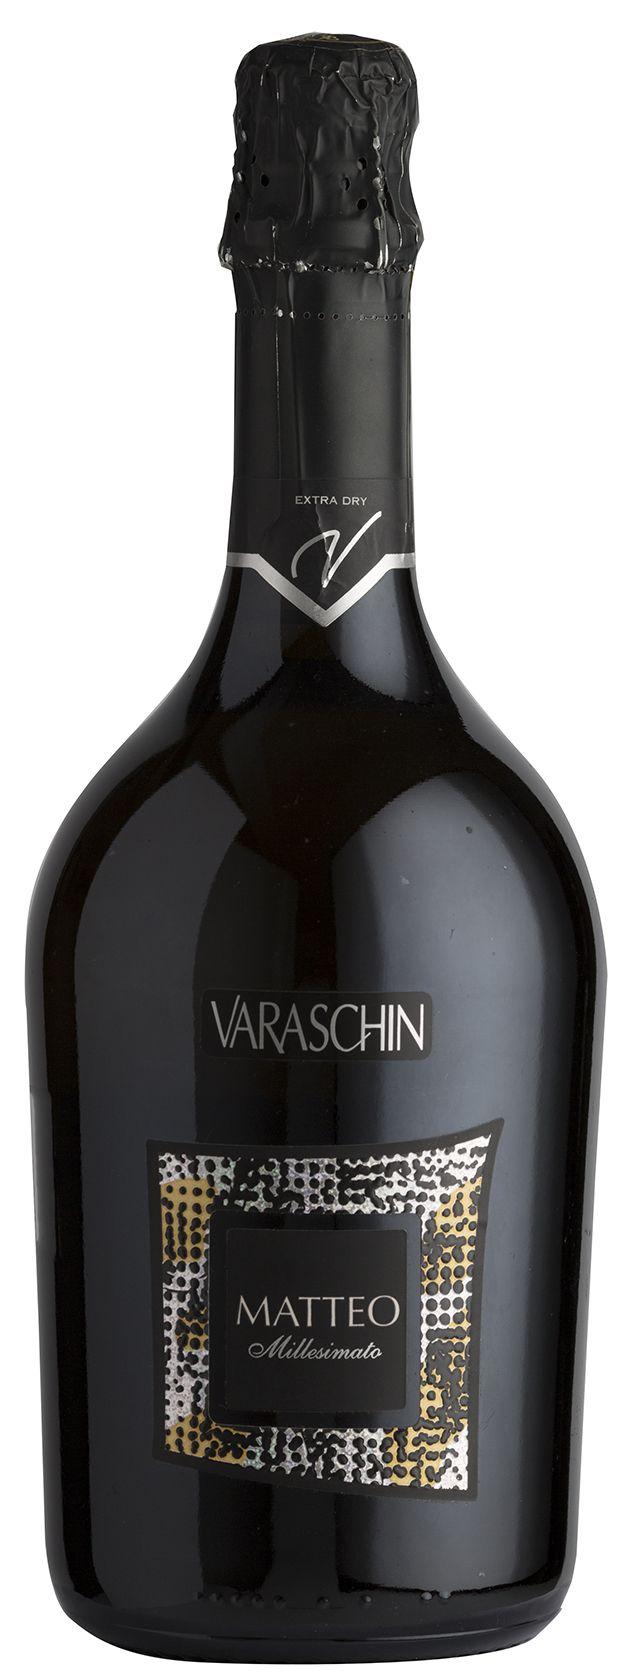 Millesimo Matteo - Varaschin #winelabel #winedesign #italianwine #Francescon #Collodi #francesconcollodi